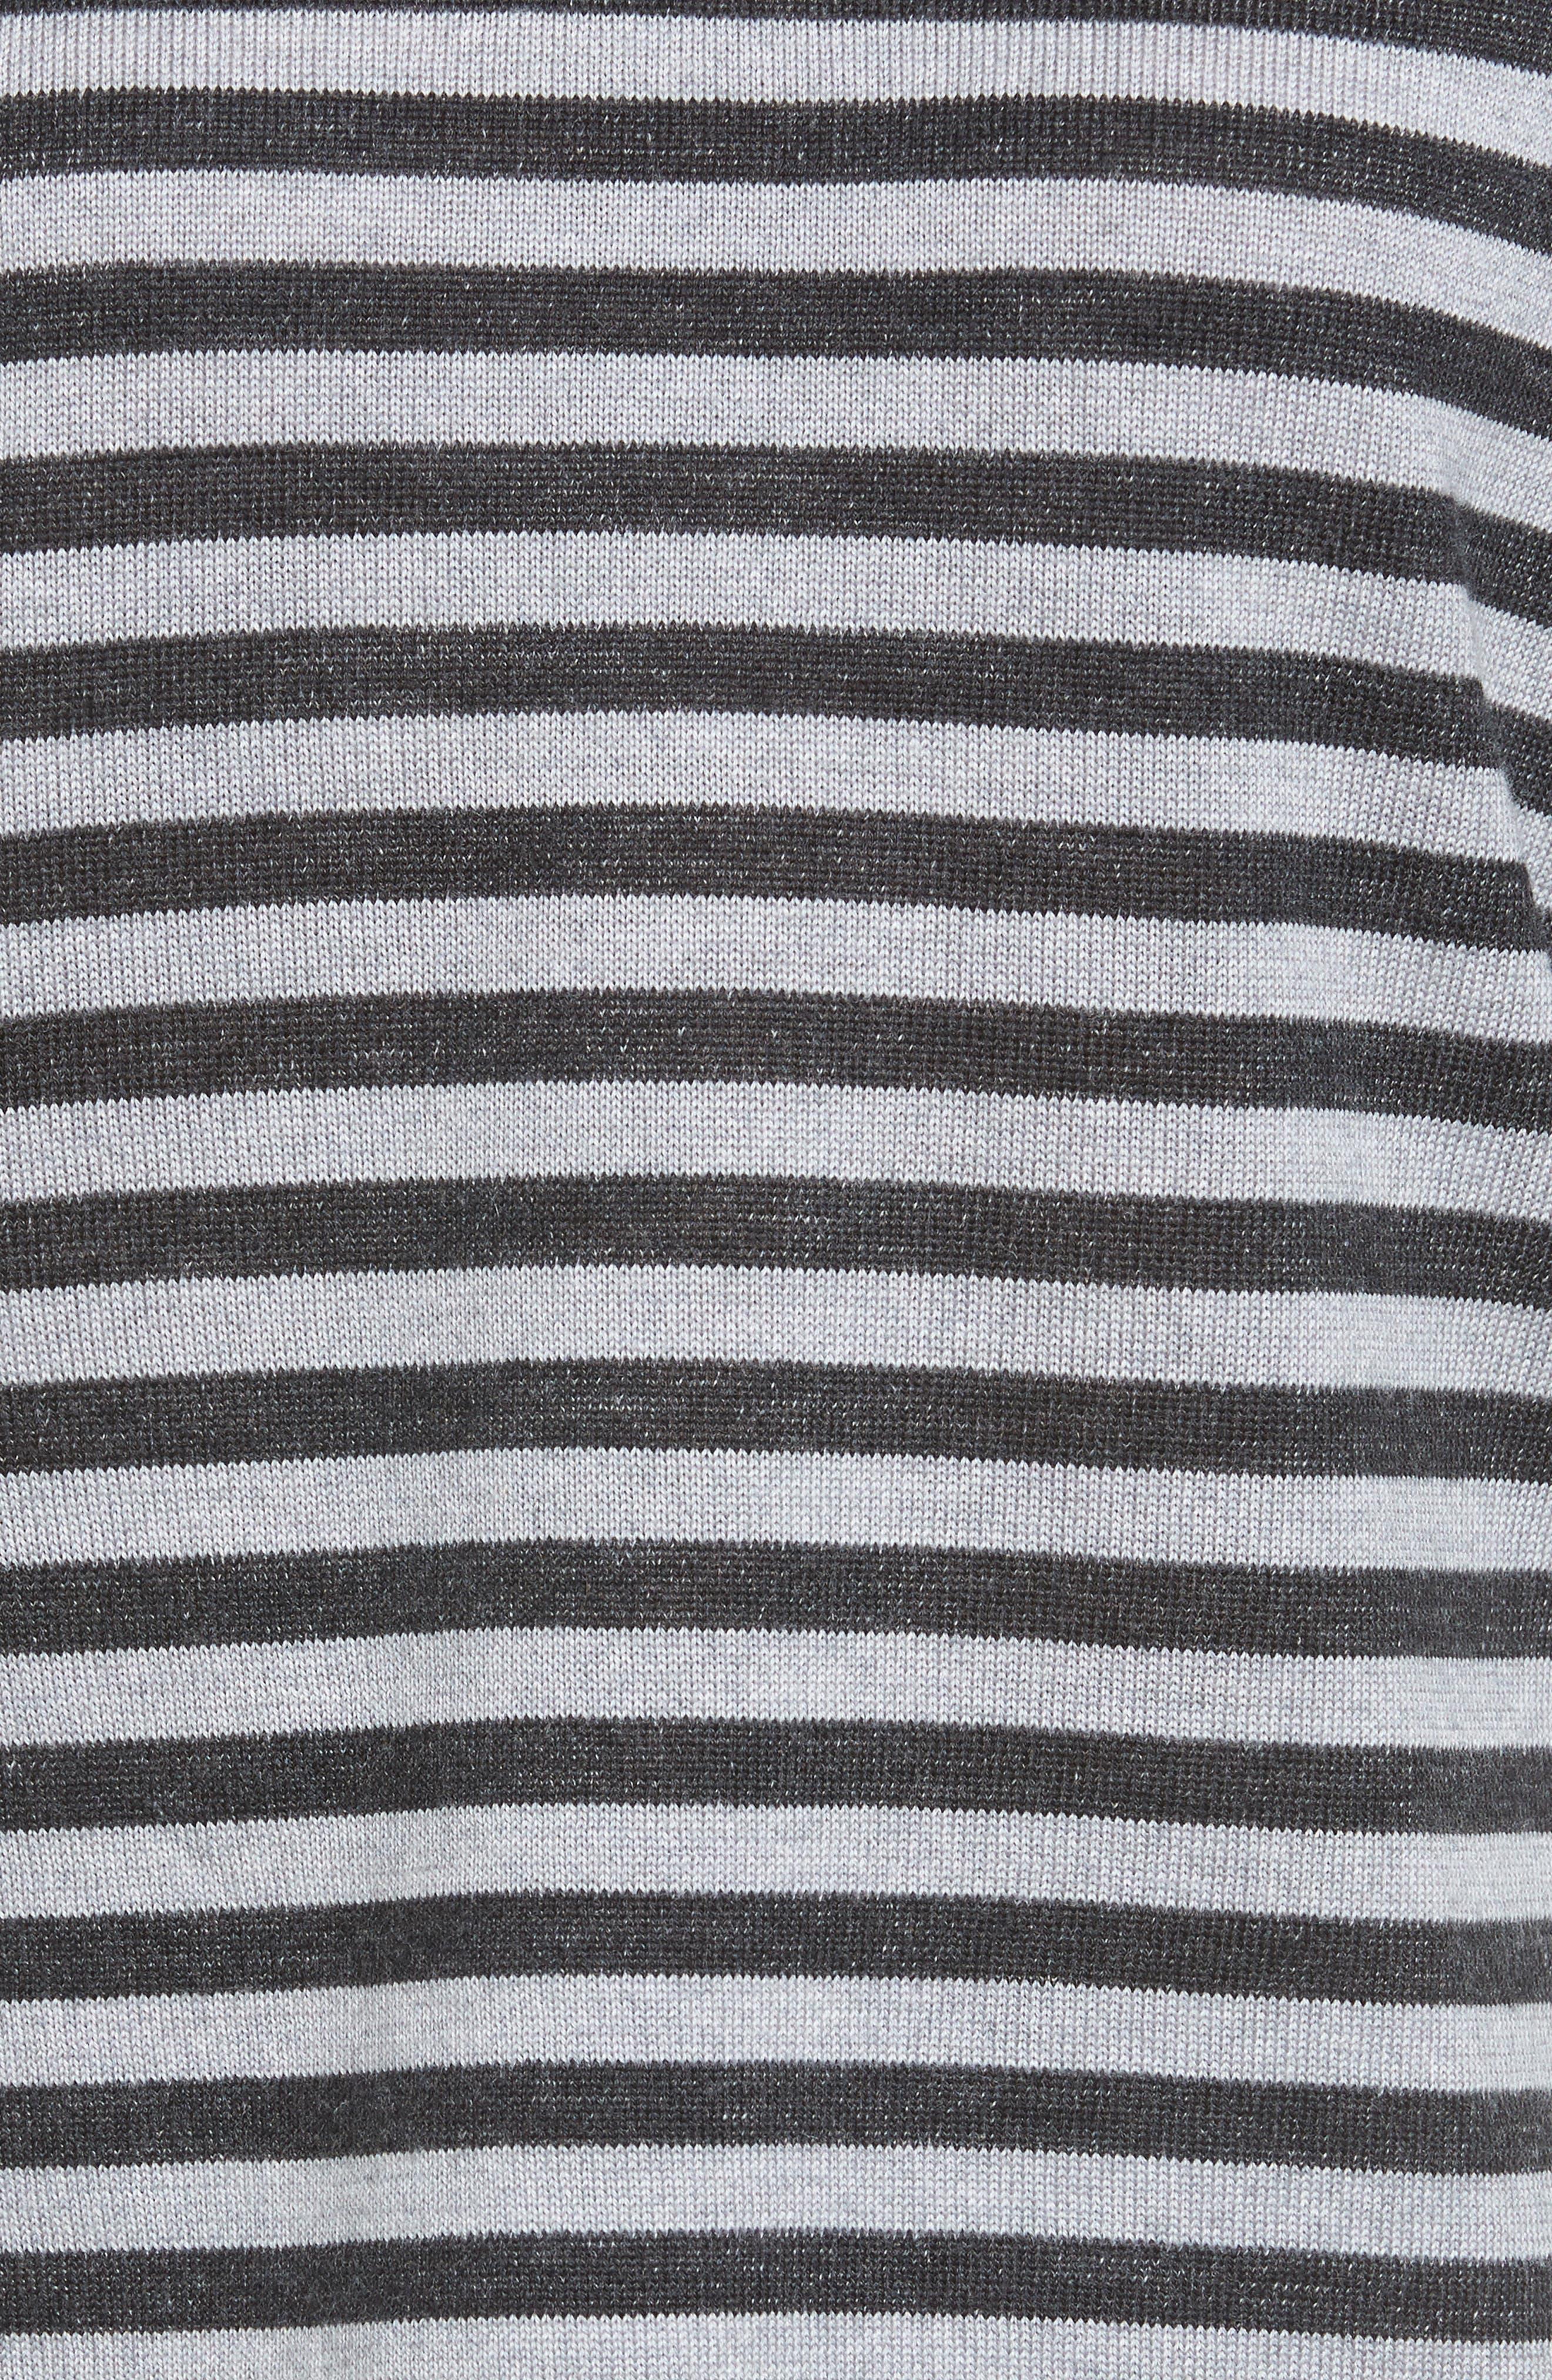 Stripe Merino Wool Pullover,                             Alternate thumbnail 5, color,                             Charcoal/ Dark Pearl